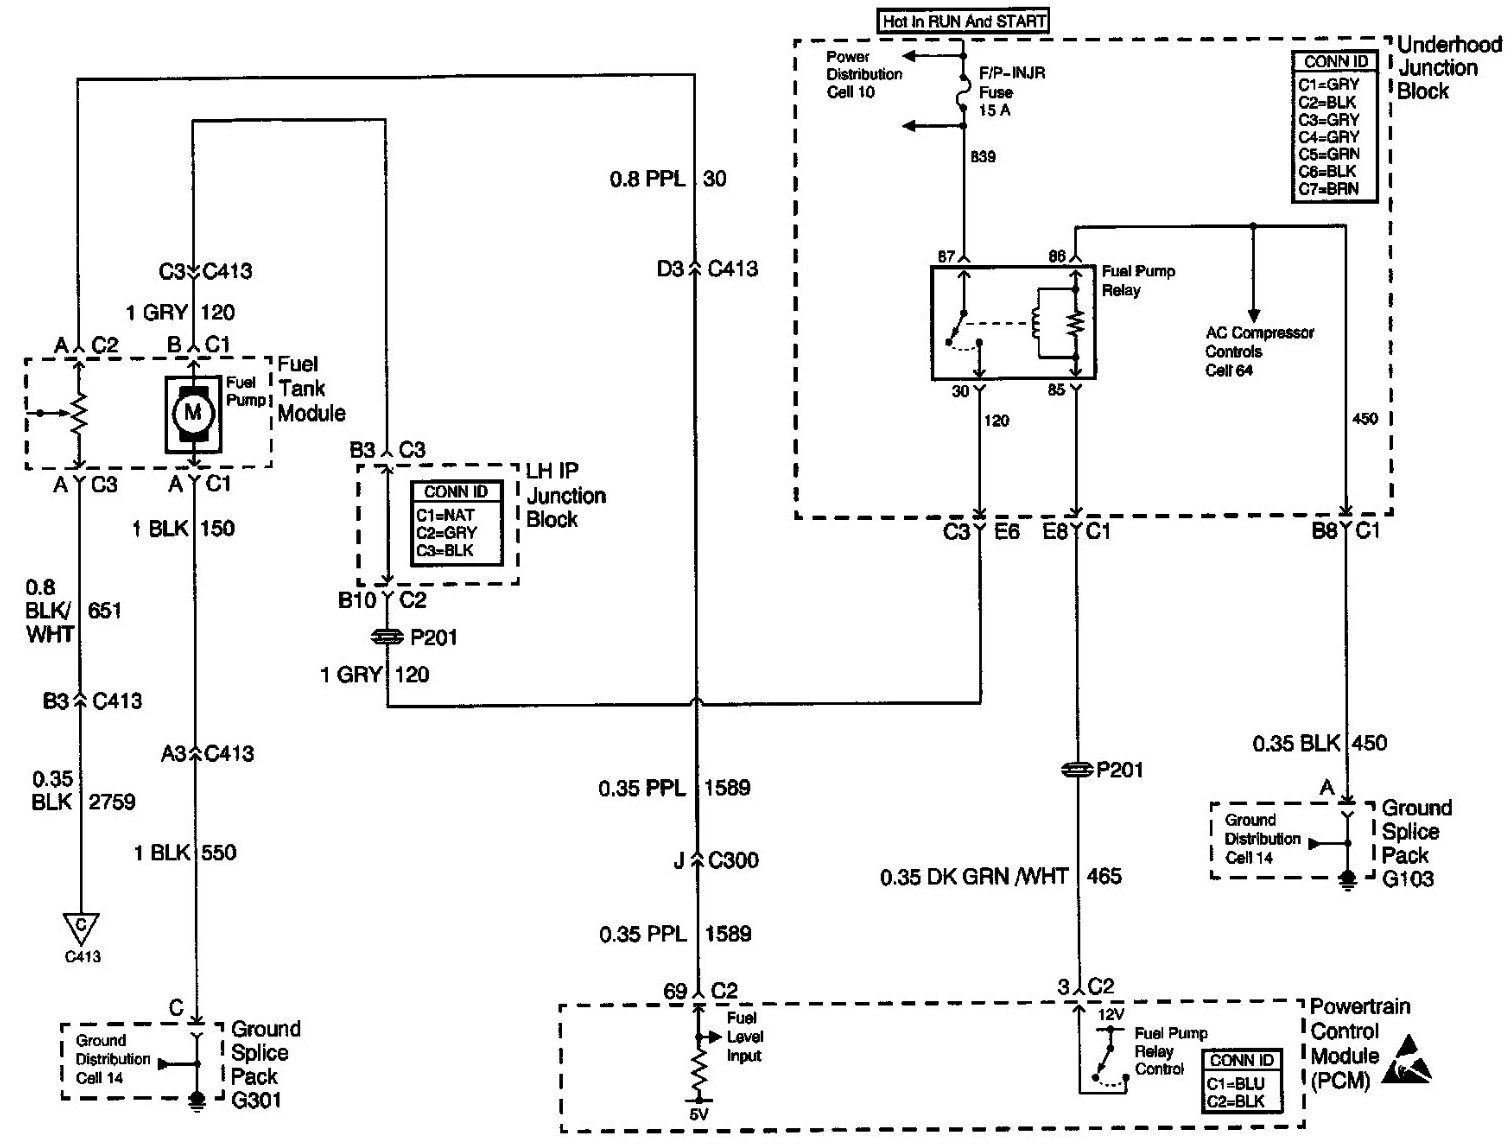 [DIAGRAM_38ZD]  KV_4664] 2004 Pontiac Grand Am Fuel Pump Wiring Diagram Download Diagram | Abs Wiring Diagram For 1999 Pontiac Grand Prix |  | Lexor Tran Ifica Lious Tomy Hopad Weasi Hendil Mohammedshrine Librar Wiring  101